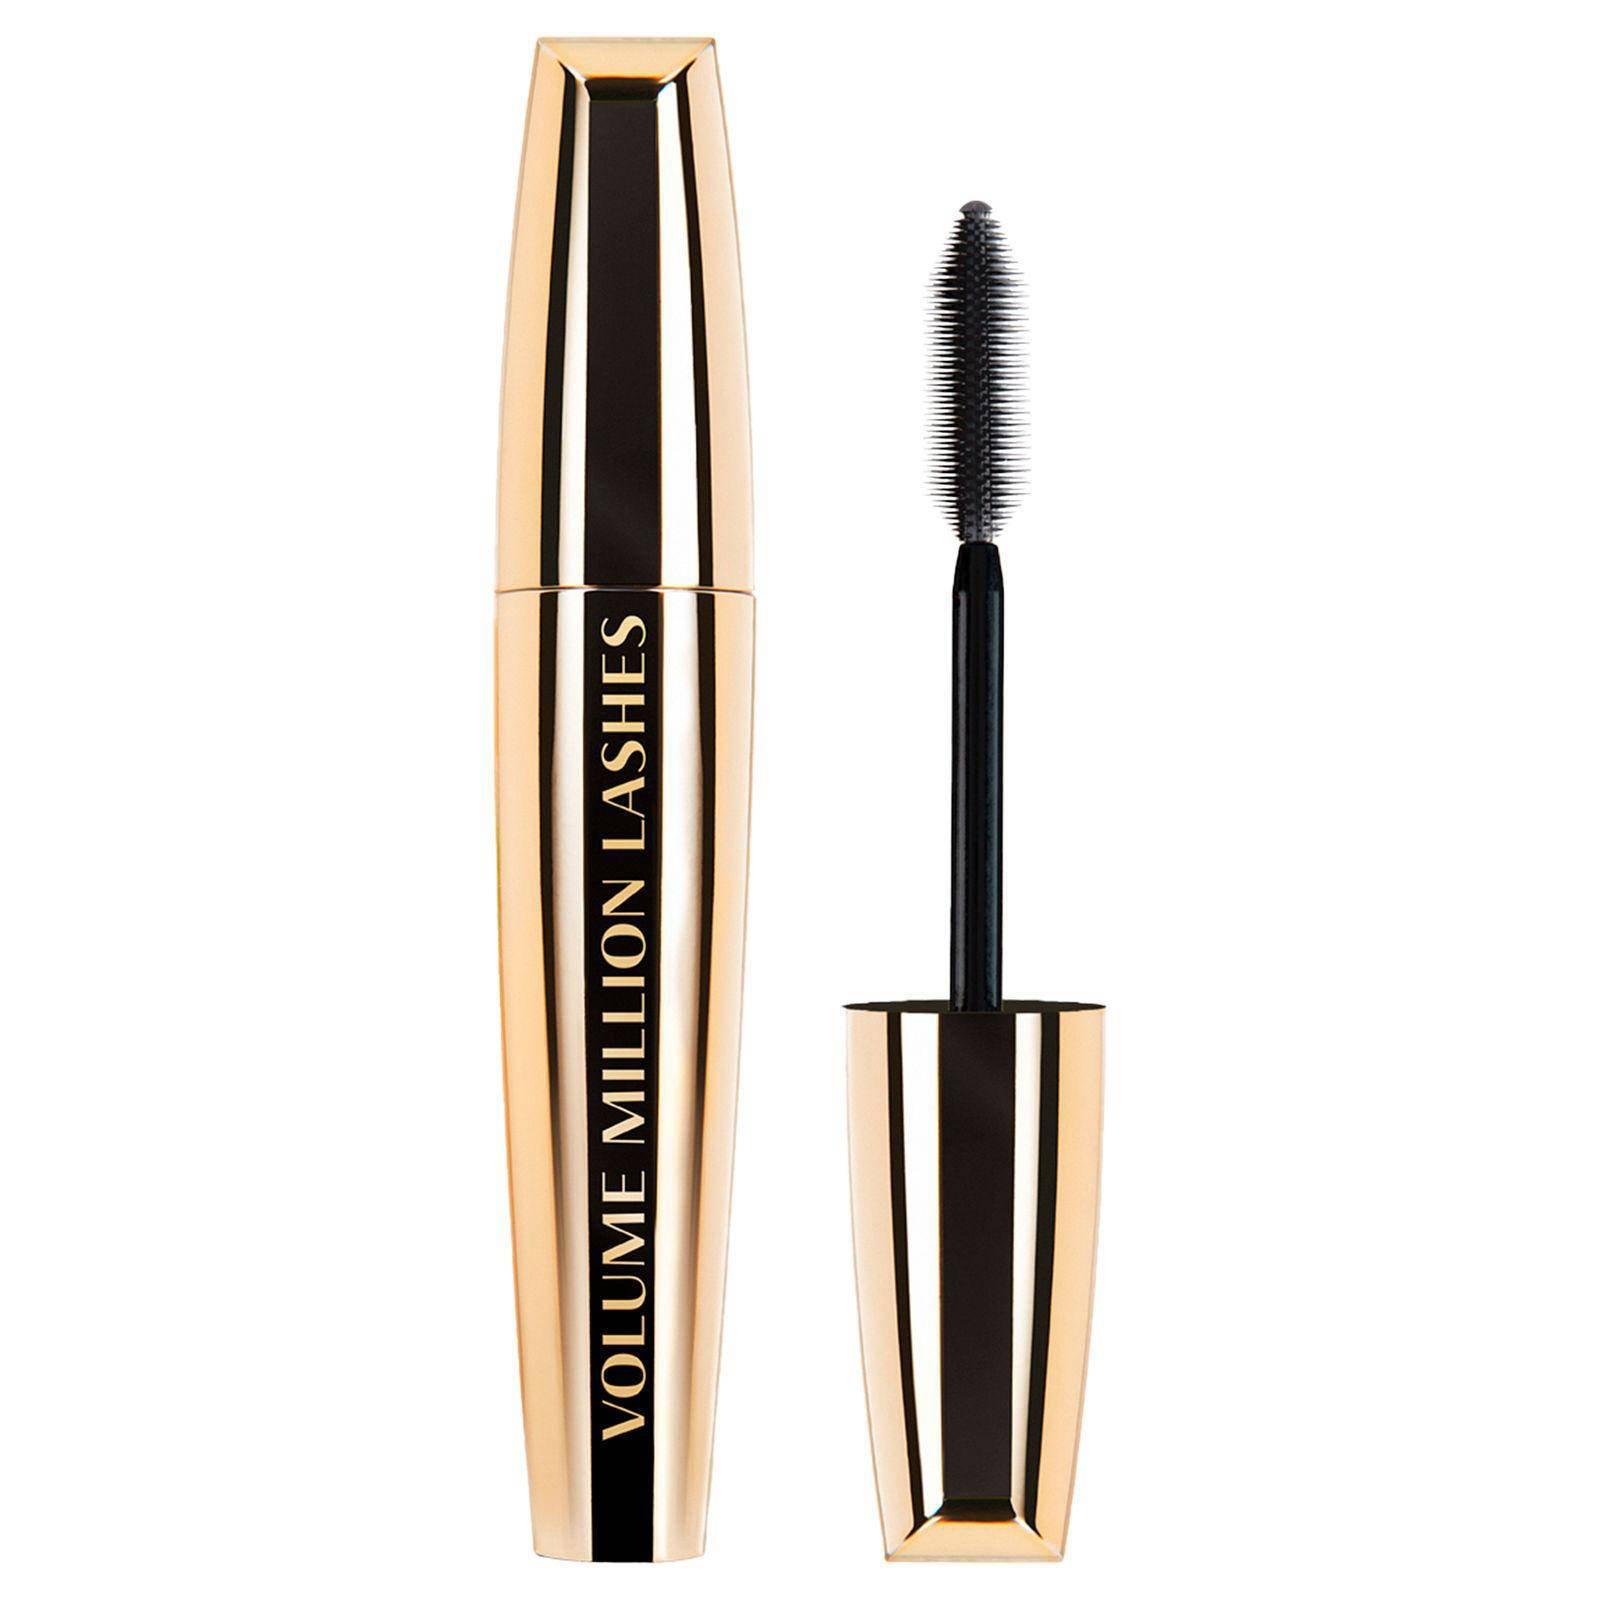 L'Oréal Paris Volume Million Lashes mascara - Black